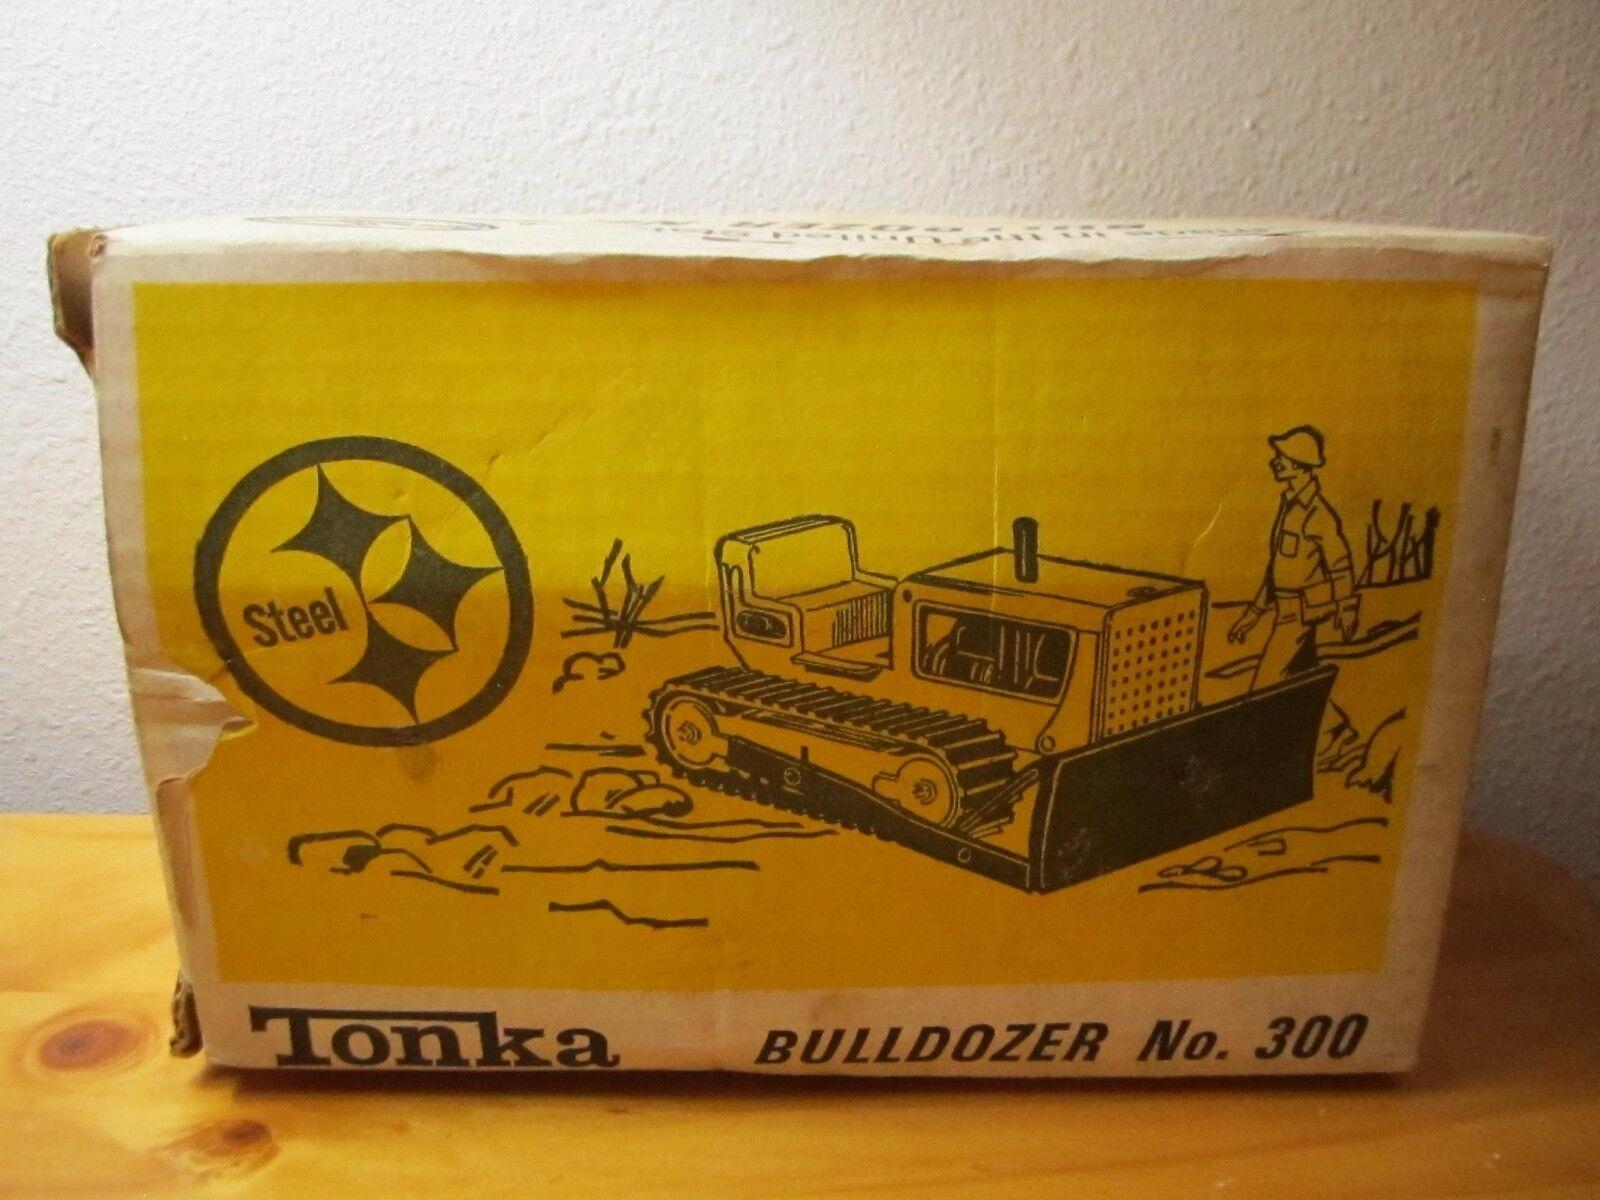 1967 Tonka Bulldozer  300 made in USA